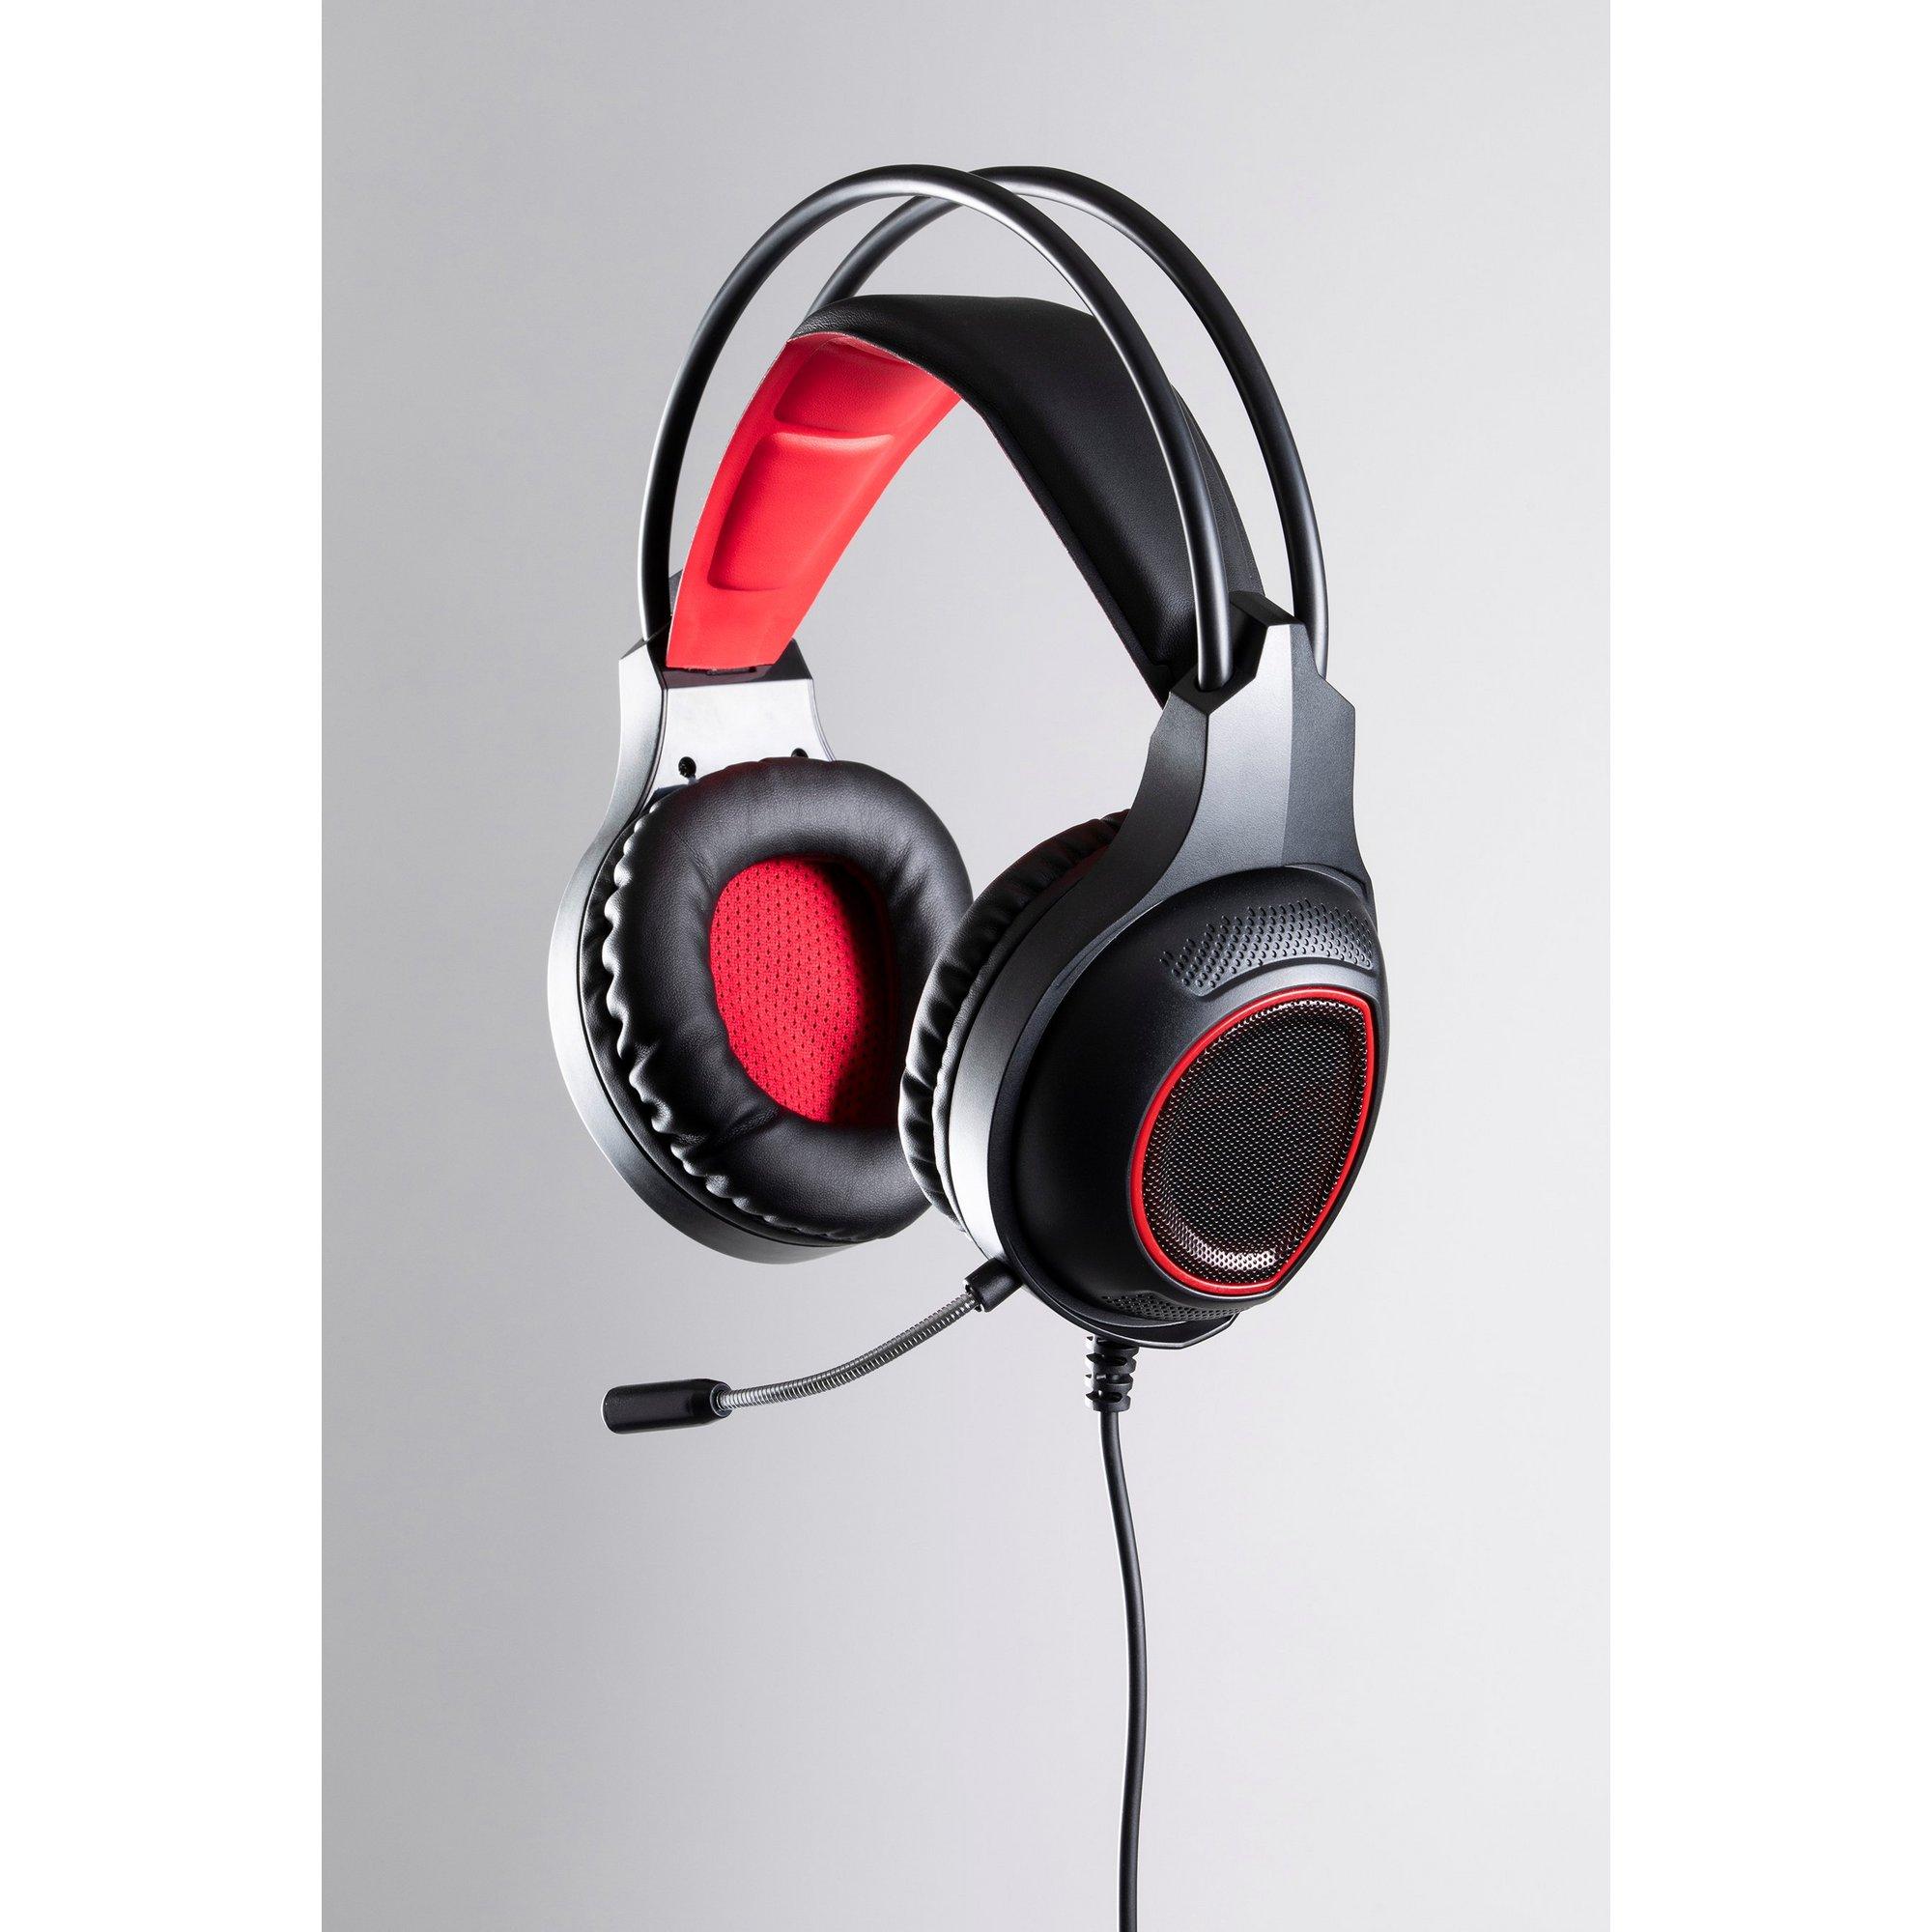 Image of Daewoo Gaming Headphones